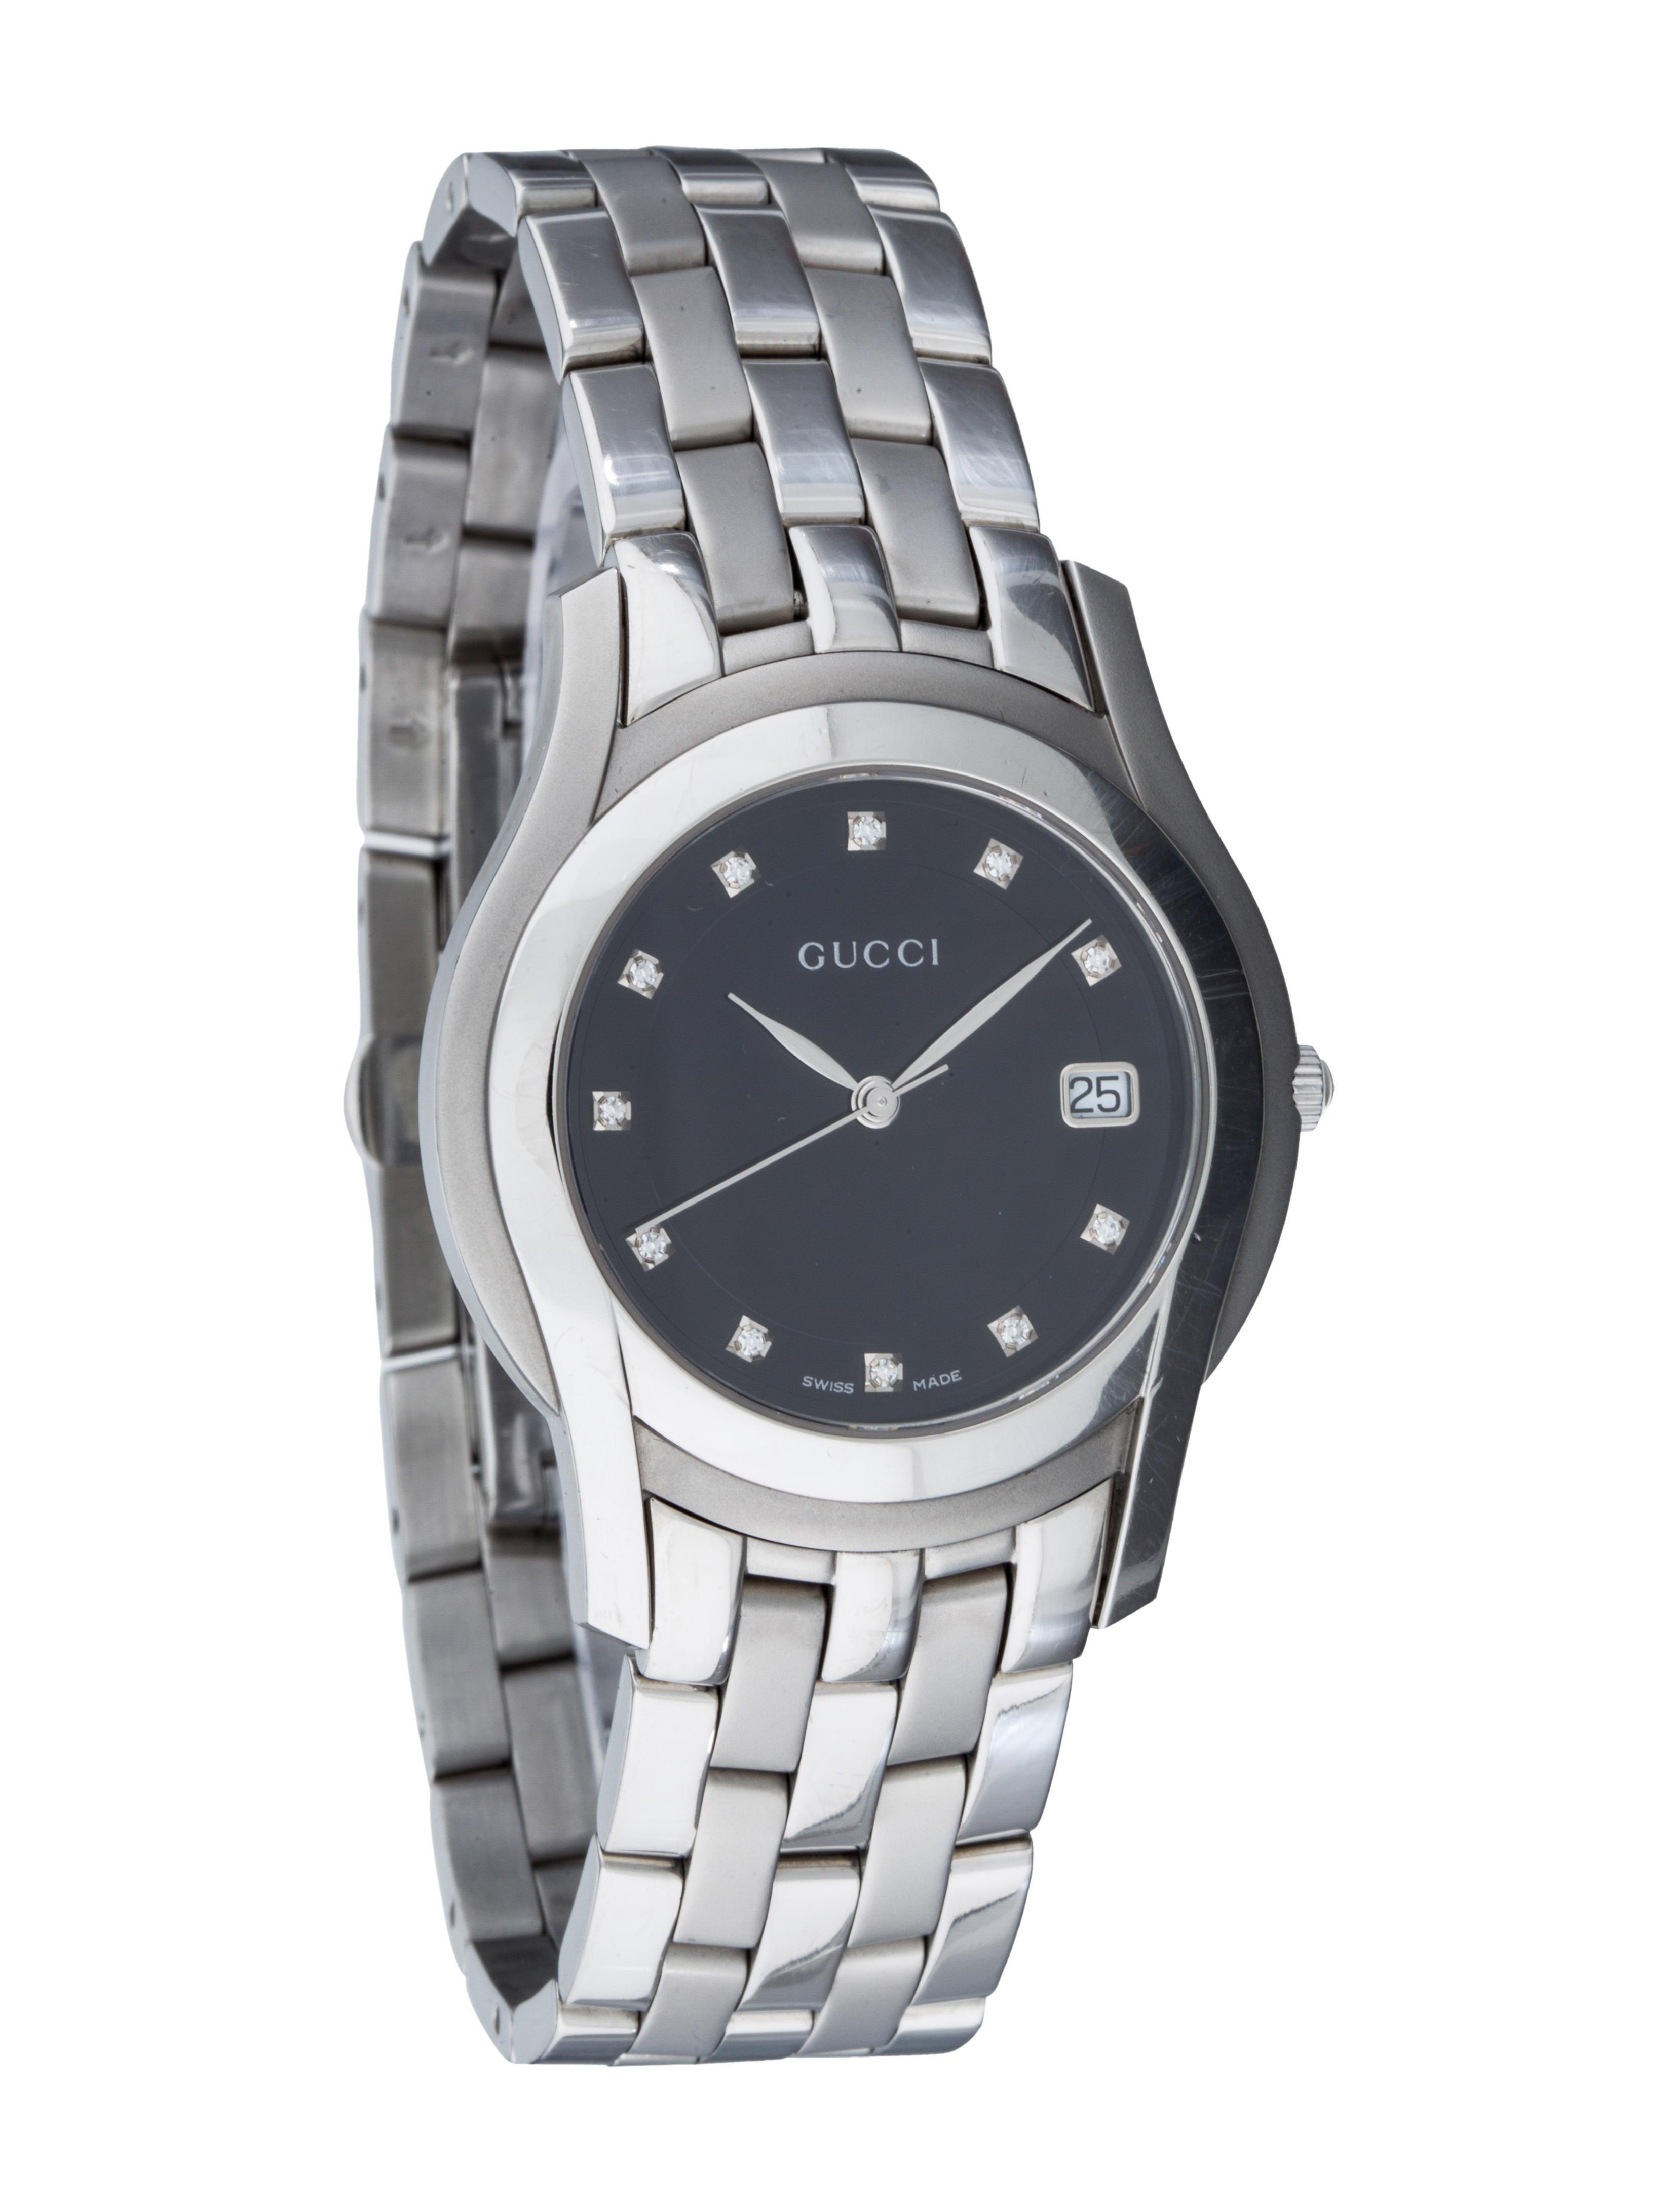 0e98bcda882 Gucci 5500M Diamond Watch - Bracelet - GUC62172